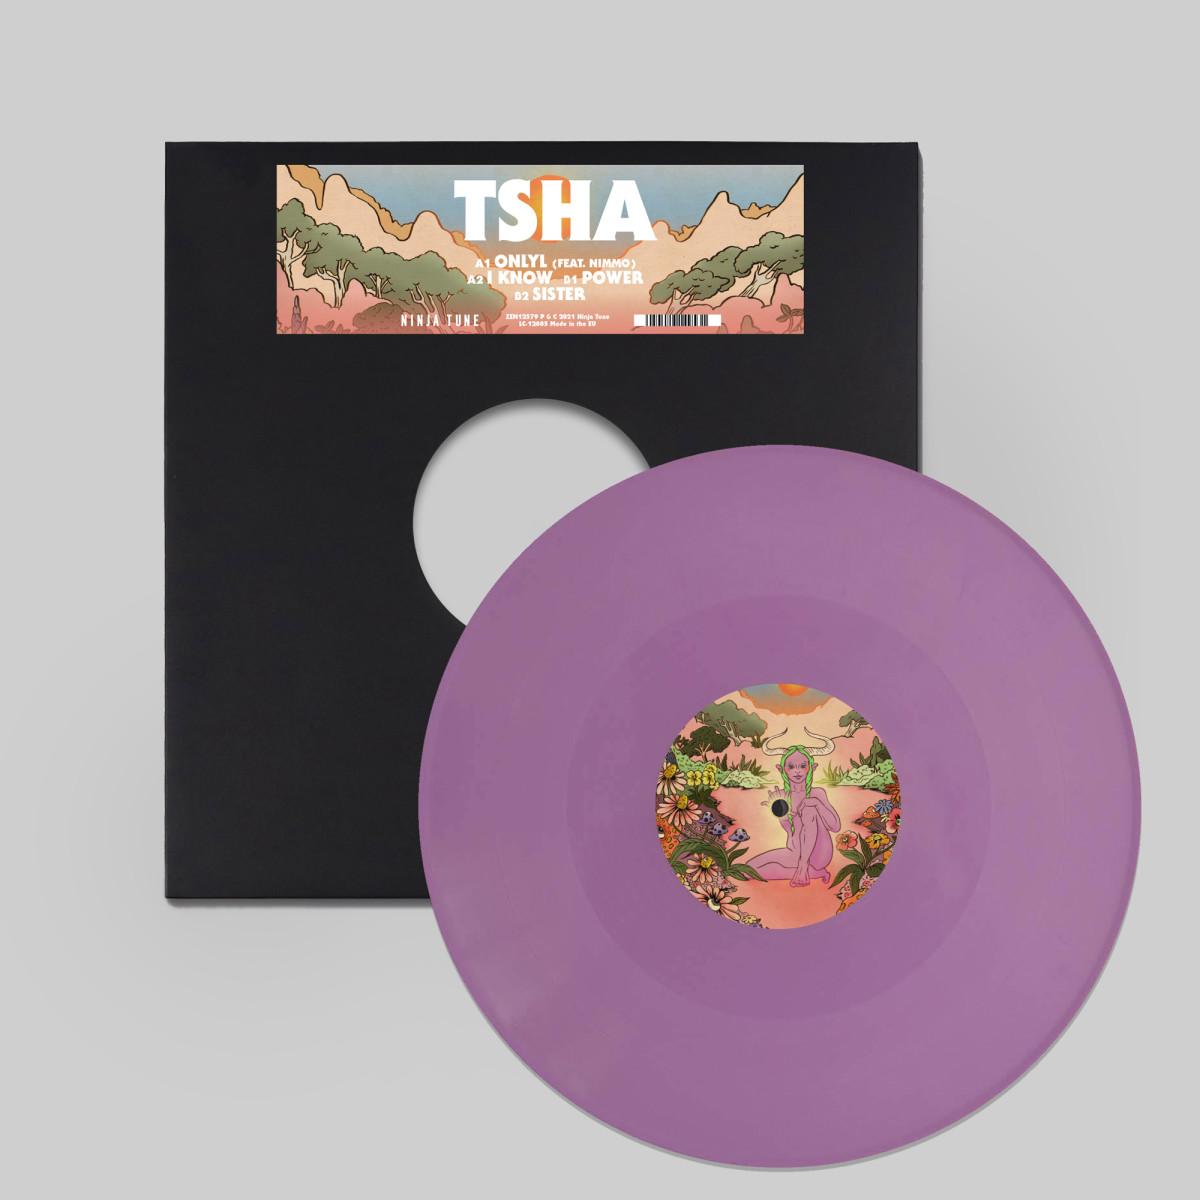 TSHA OnlyL EP Cover Art Vinyl Sleeve